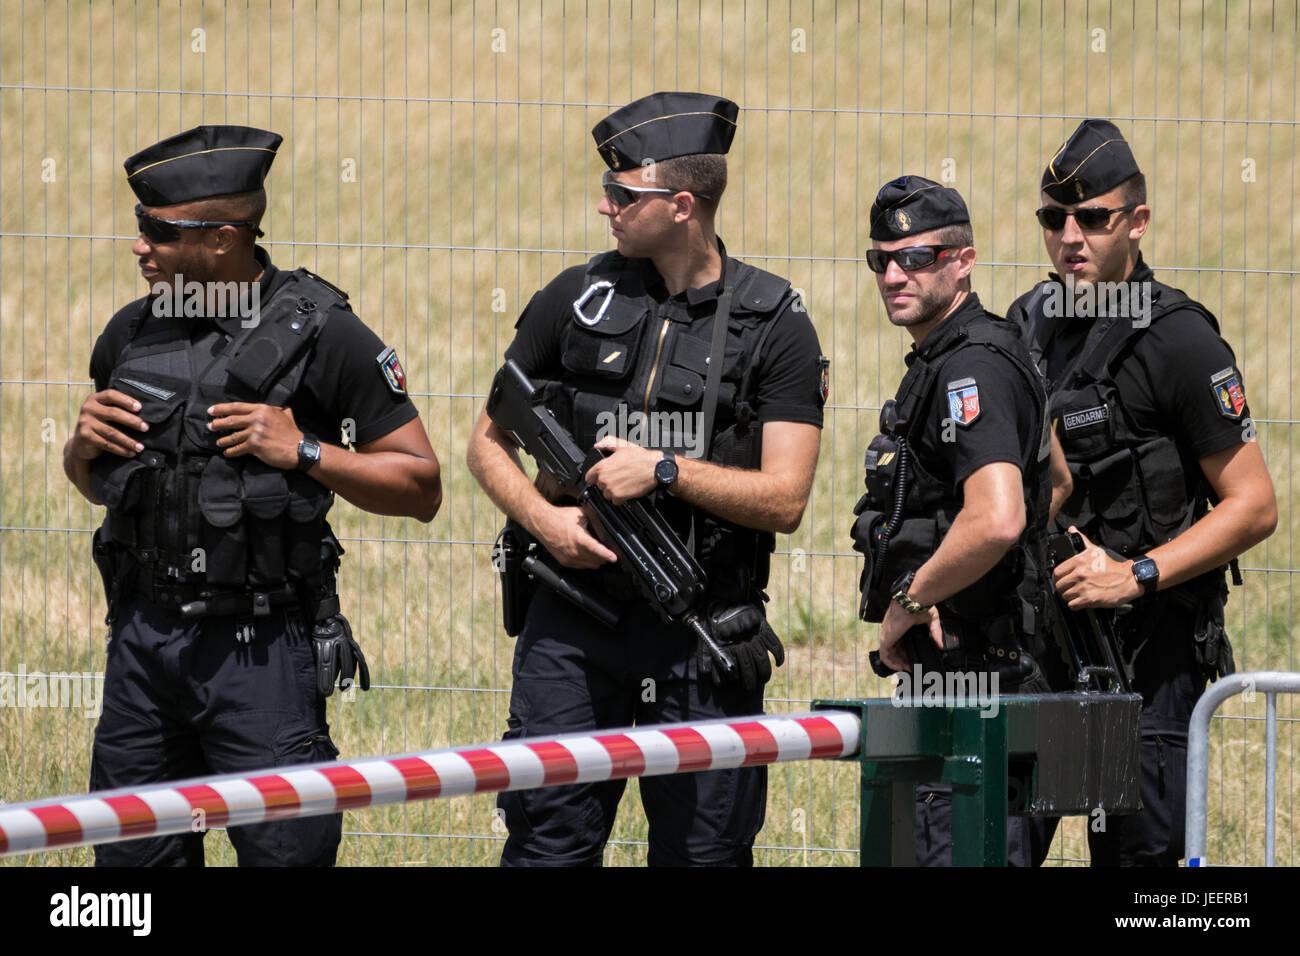 PARIS, FRANCE - JUN 23, 2017: Armed National Gendarmerie on guard at the Paris Air Show - Stock Image